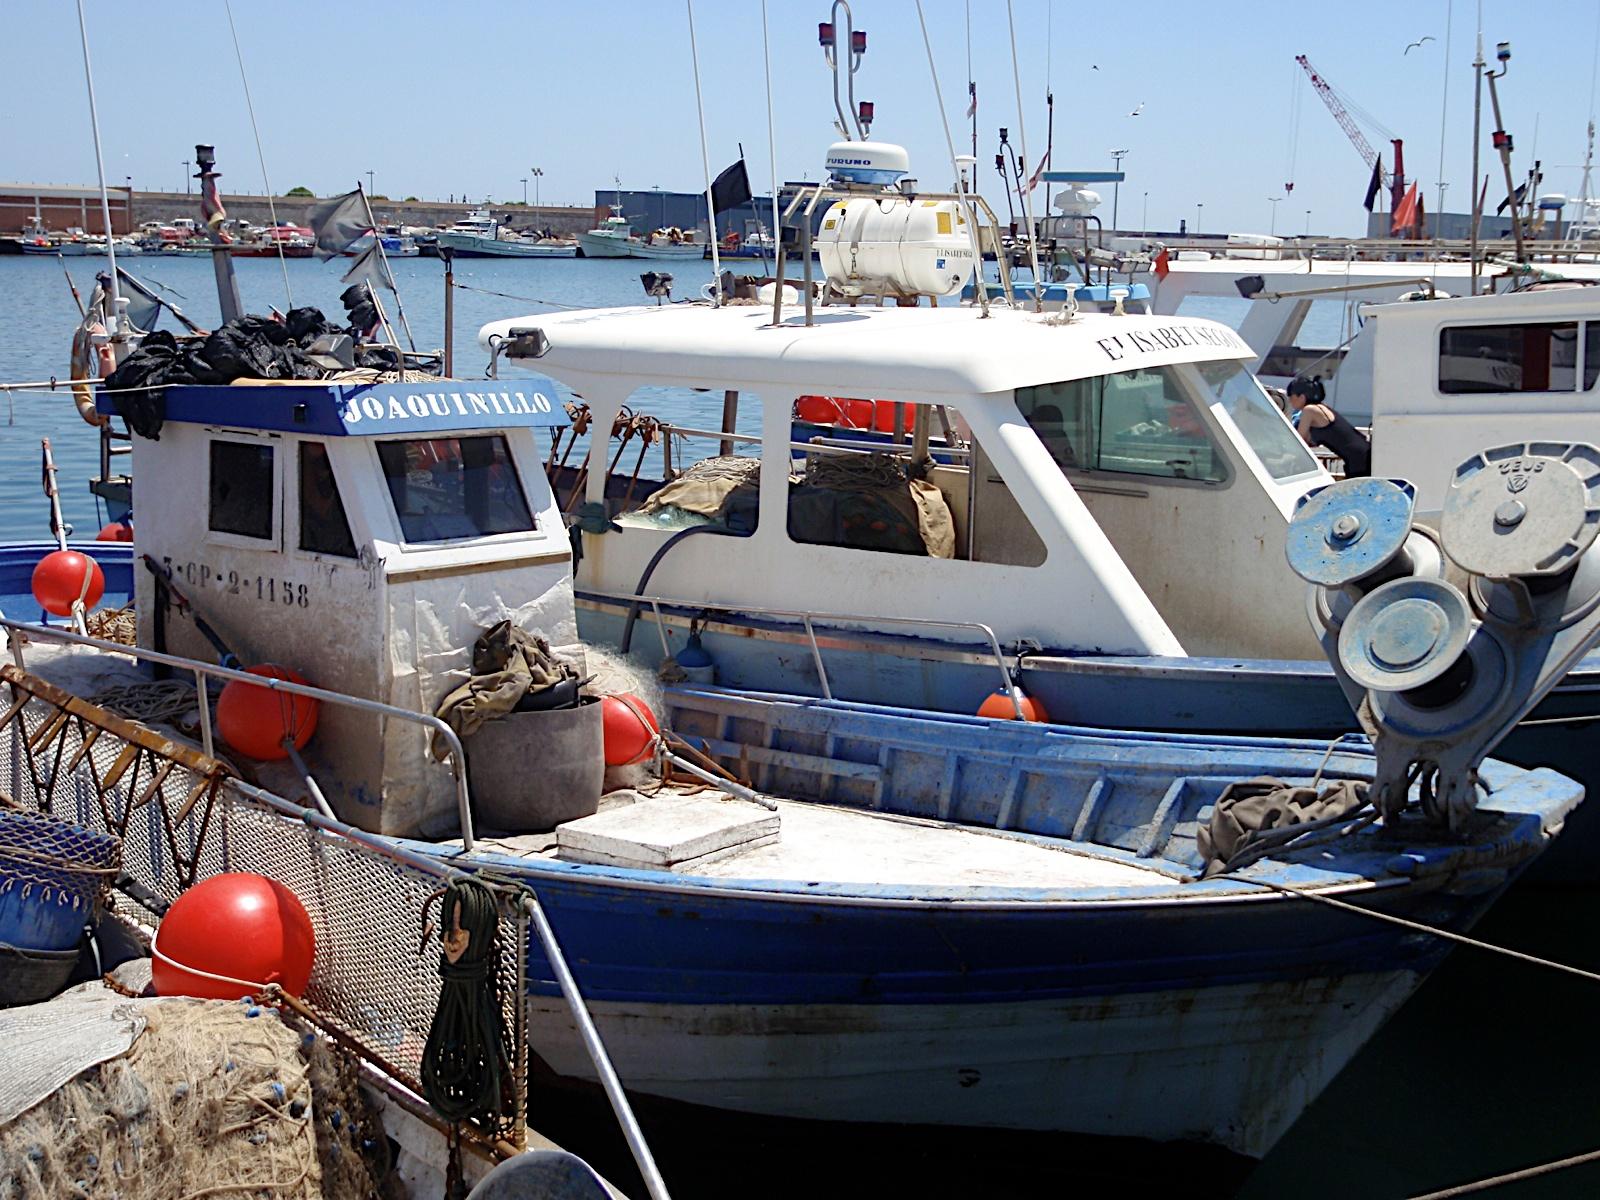 Monogràfic Marí 2010 - P5290232.JPG